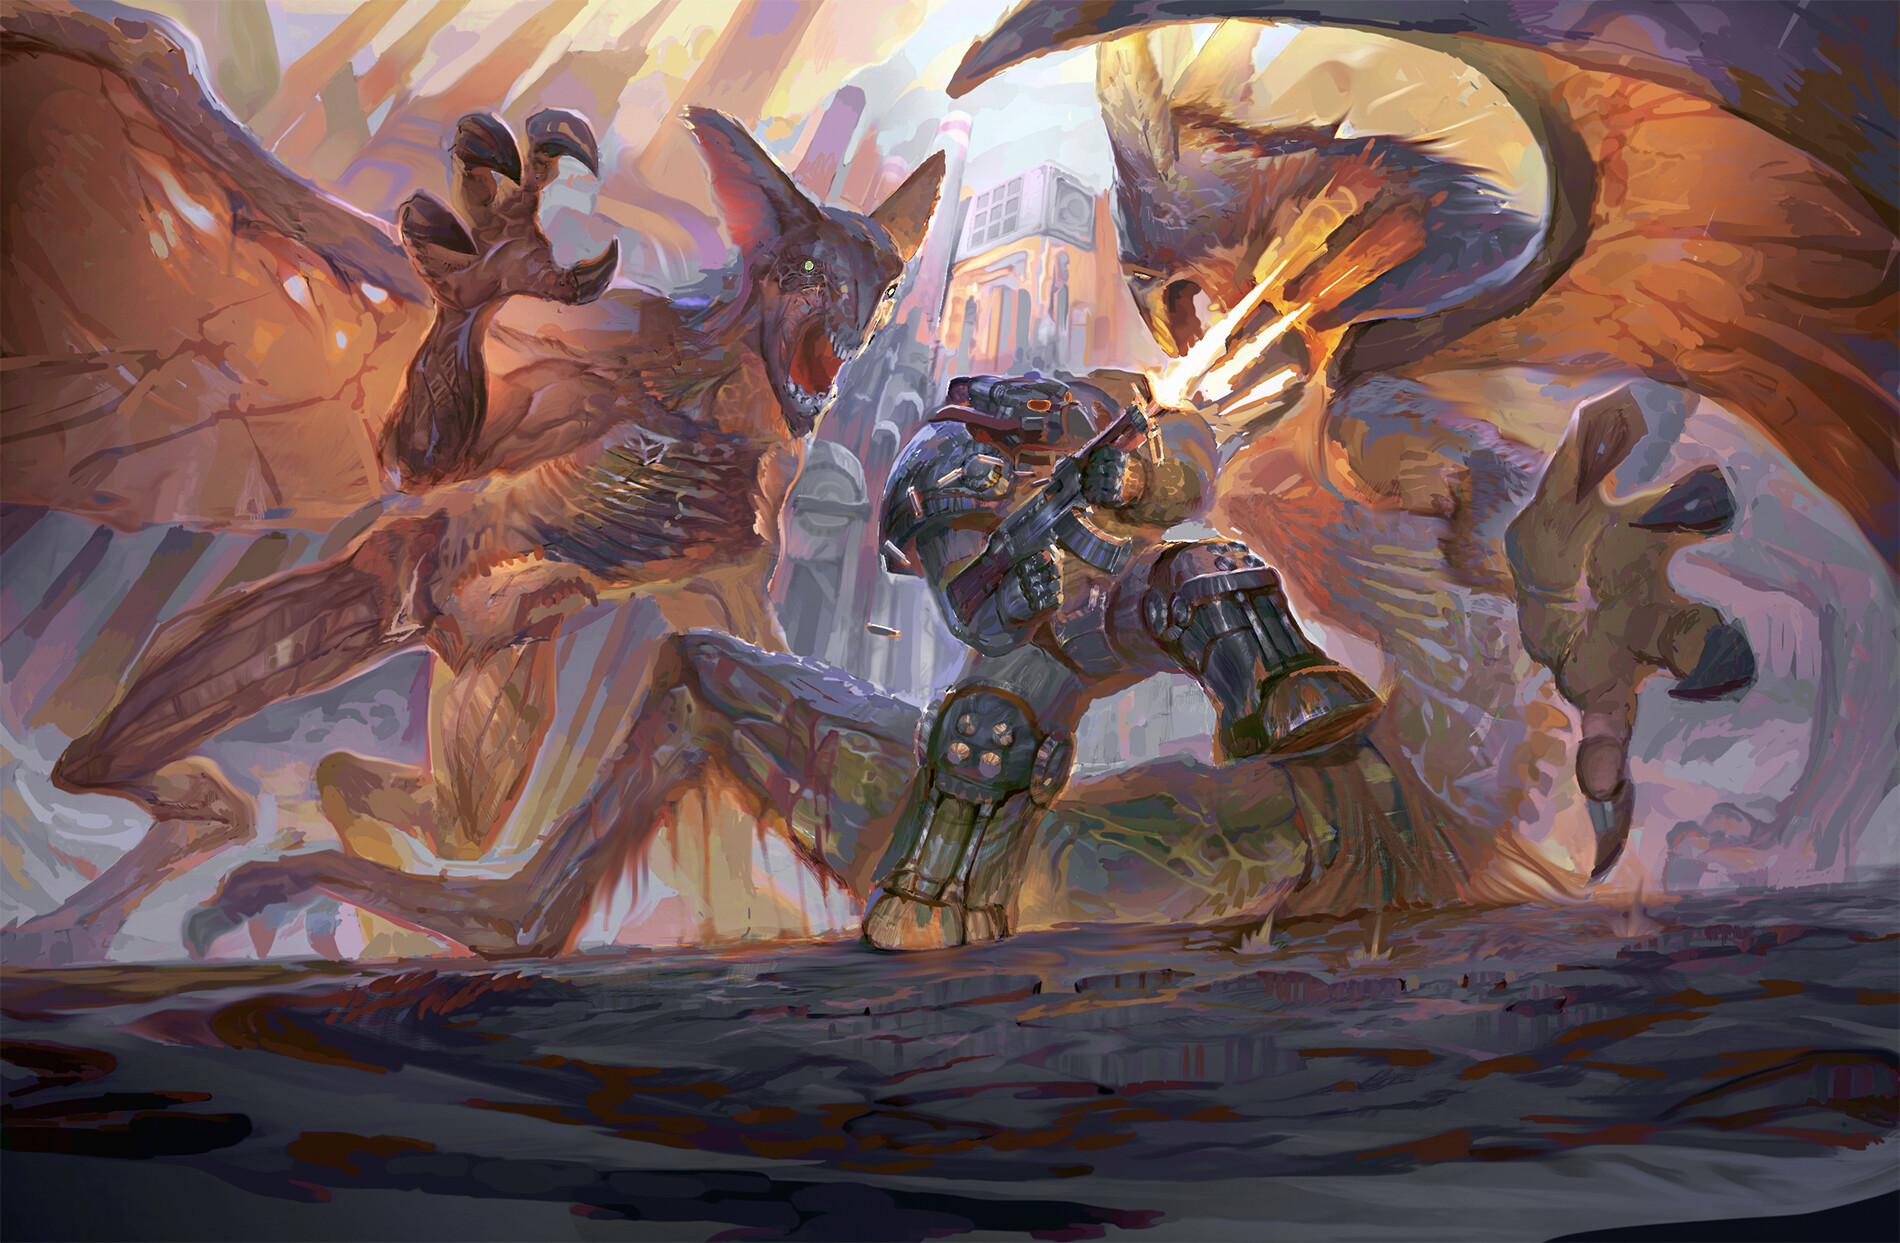 76_Fallout-76-Fallout-фэндомы-Power-Armor-5412364